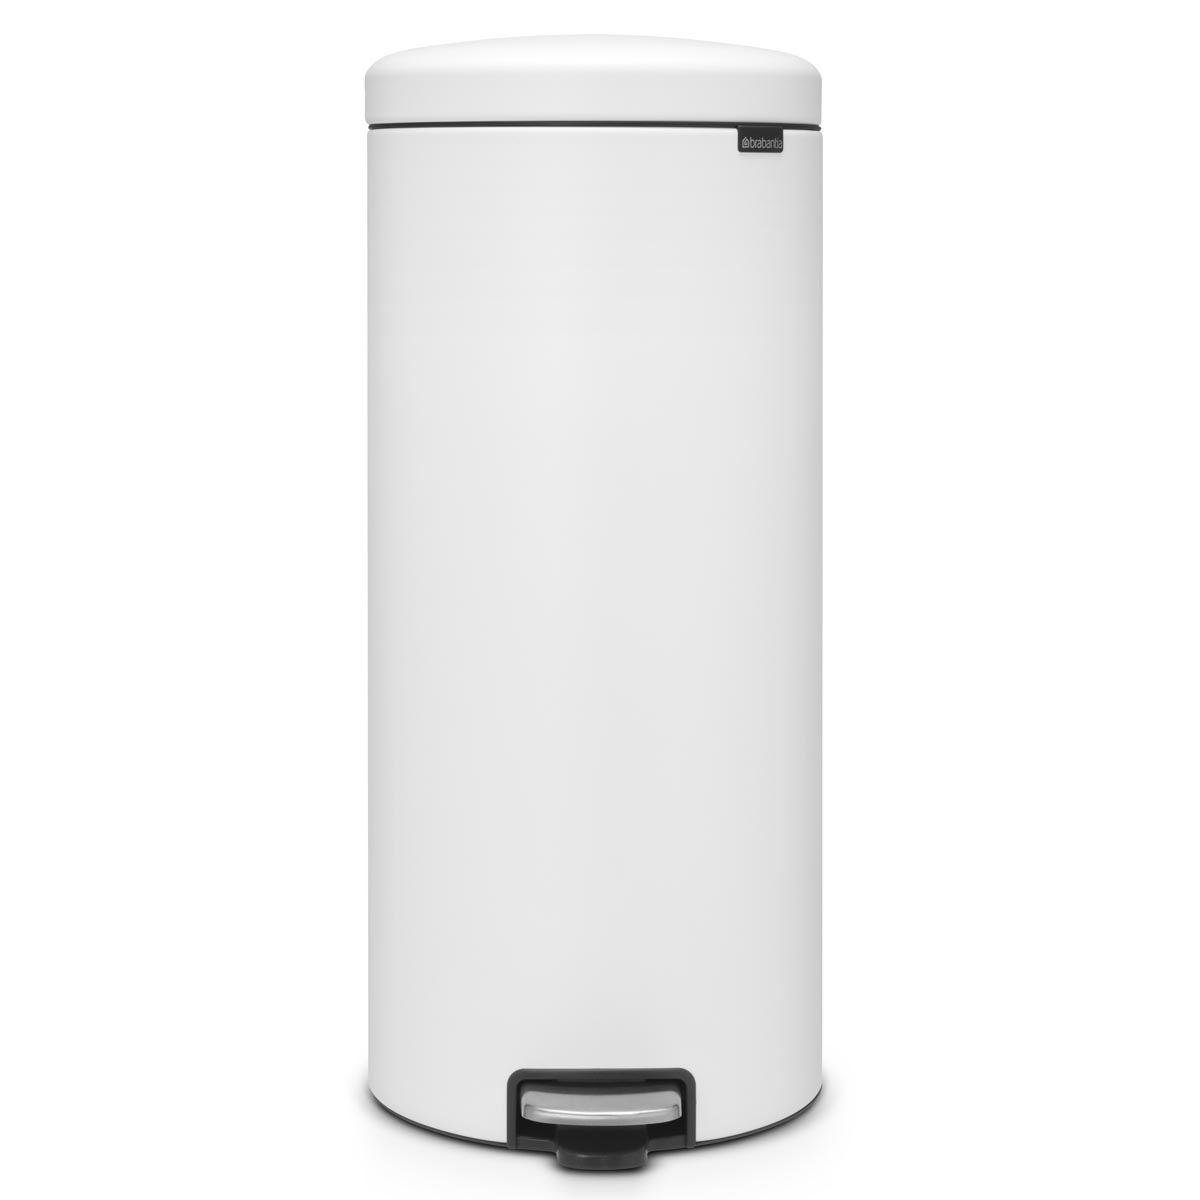 Brabantia newIcon Pedal Bin 30 Litre Plastic Bucket Mineral Eternal White